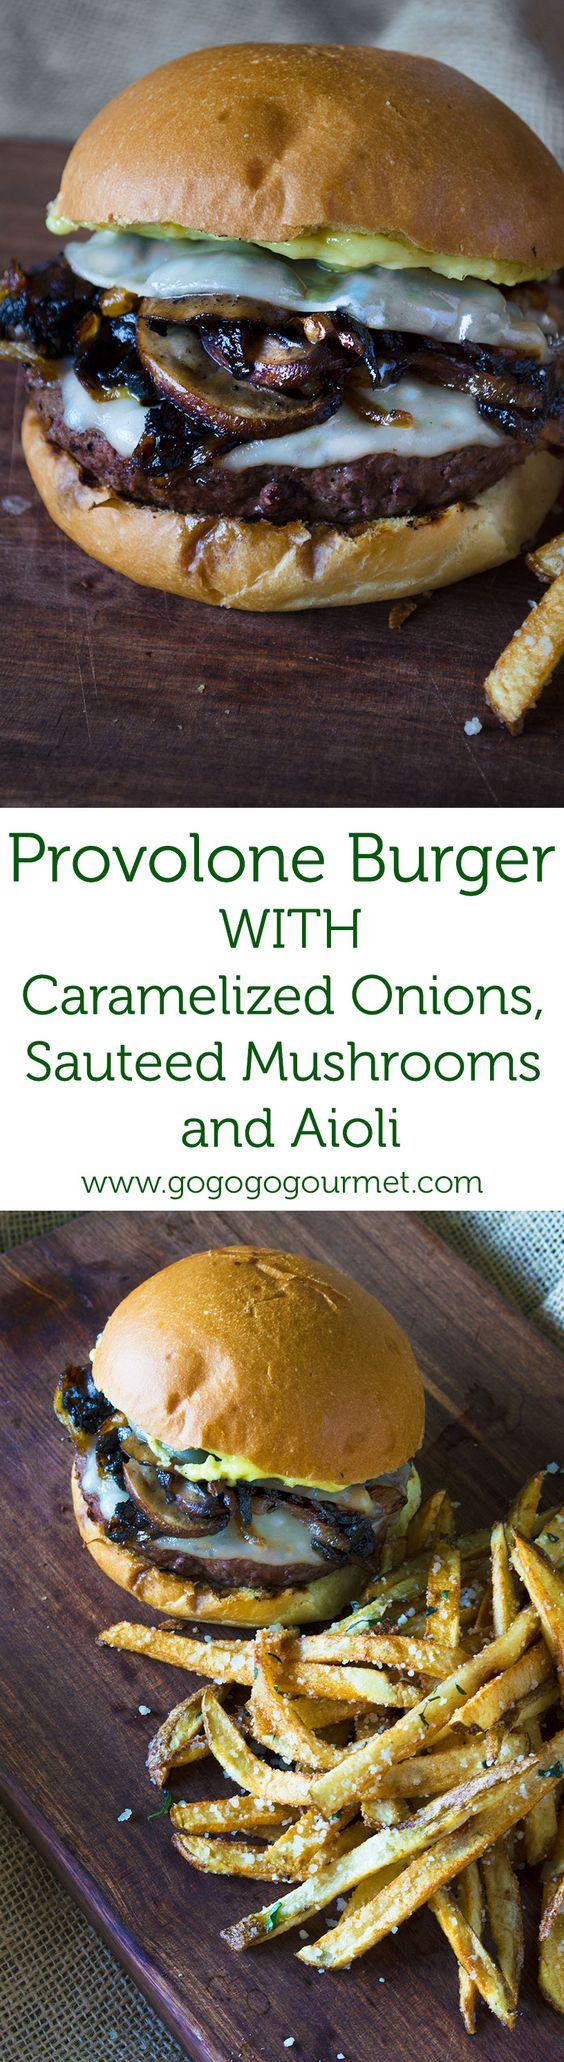 Mushroom Burger with Melted Provolone, Caramelized Onions and Aioli | Go Go Go Gourmet @gogogogourmet